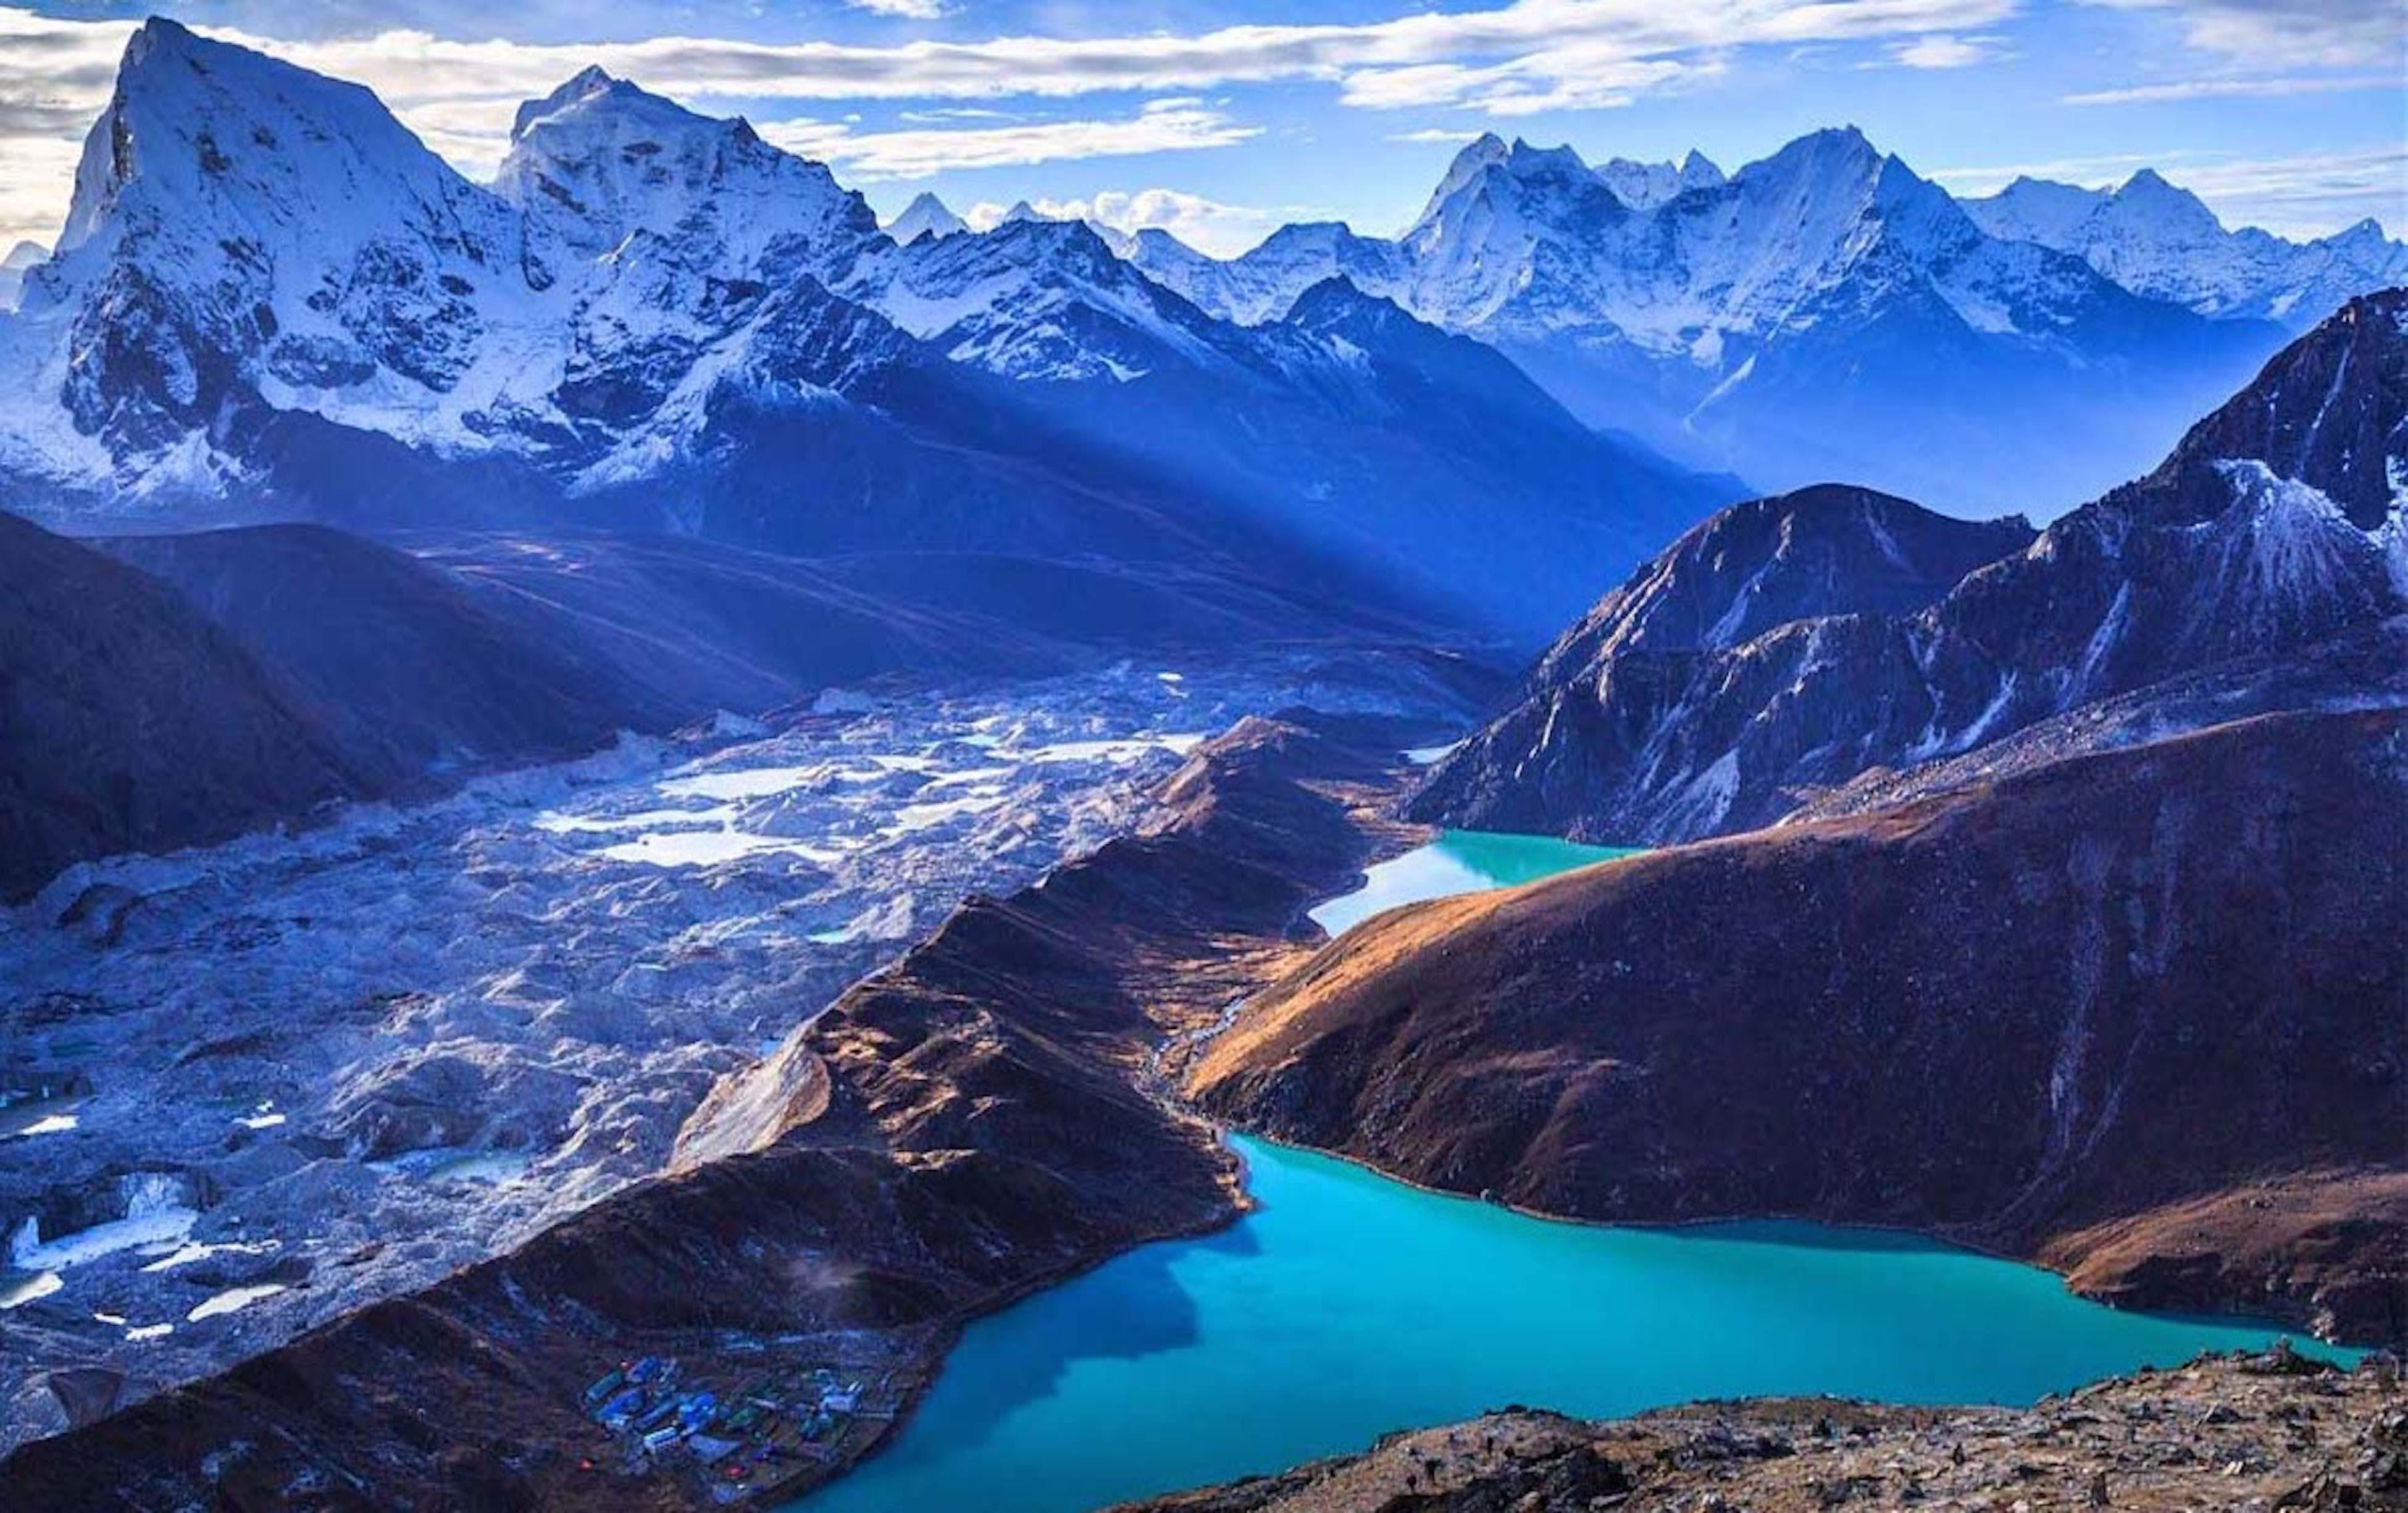 Beautiful Winter Wallpapers Hd Everest Base Camp Cho La Pass Trek Gokyo Everest Base